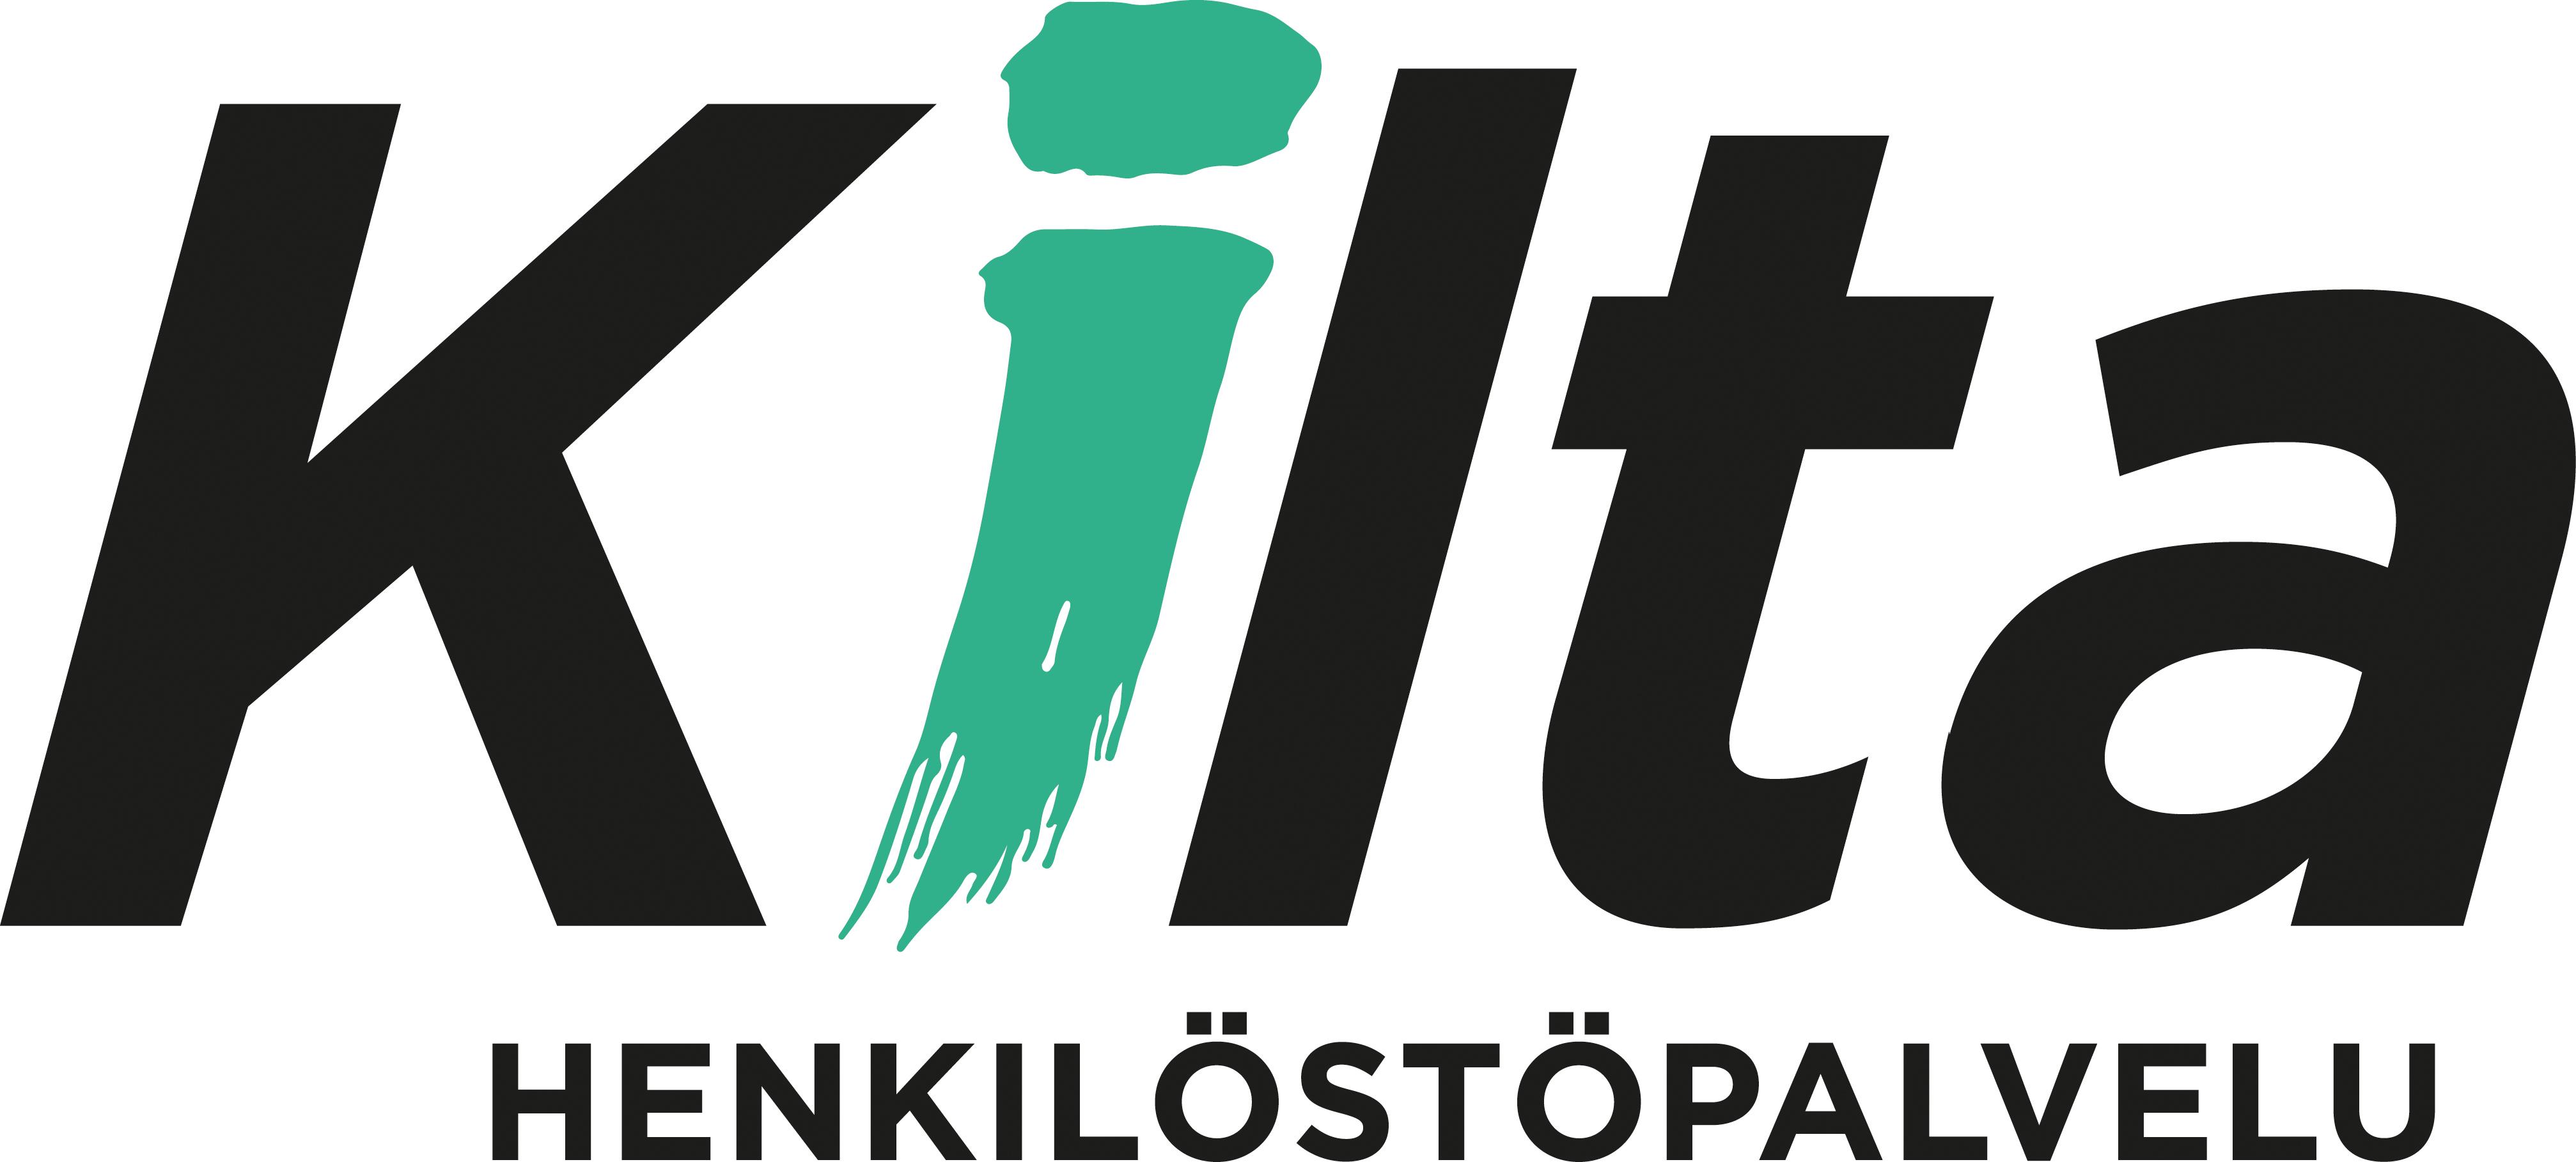 Kilta Henkilöstöpalvelu Oy logo